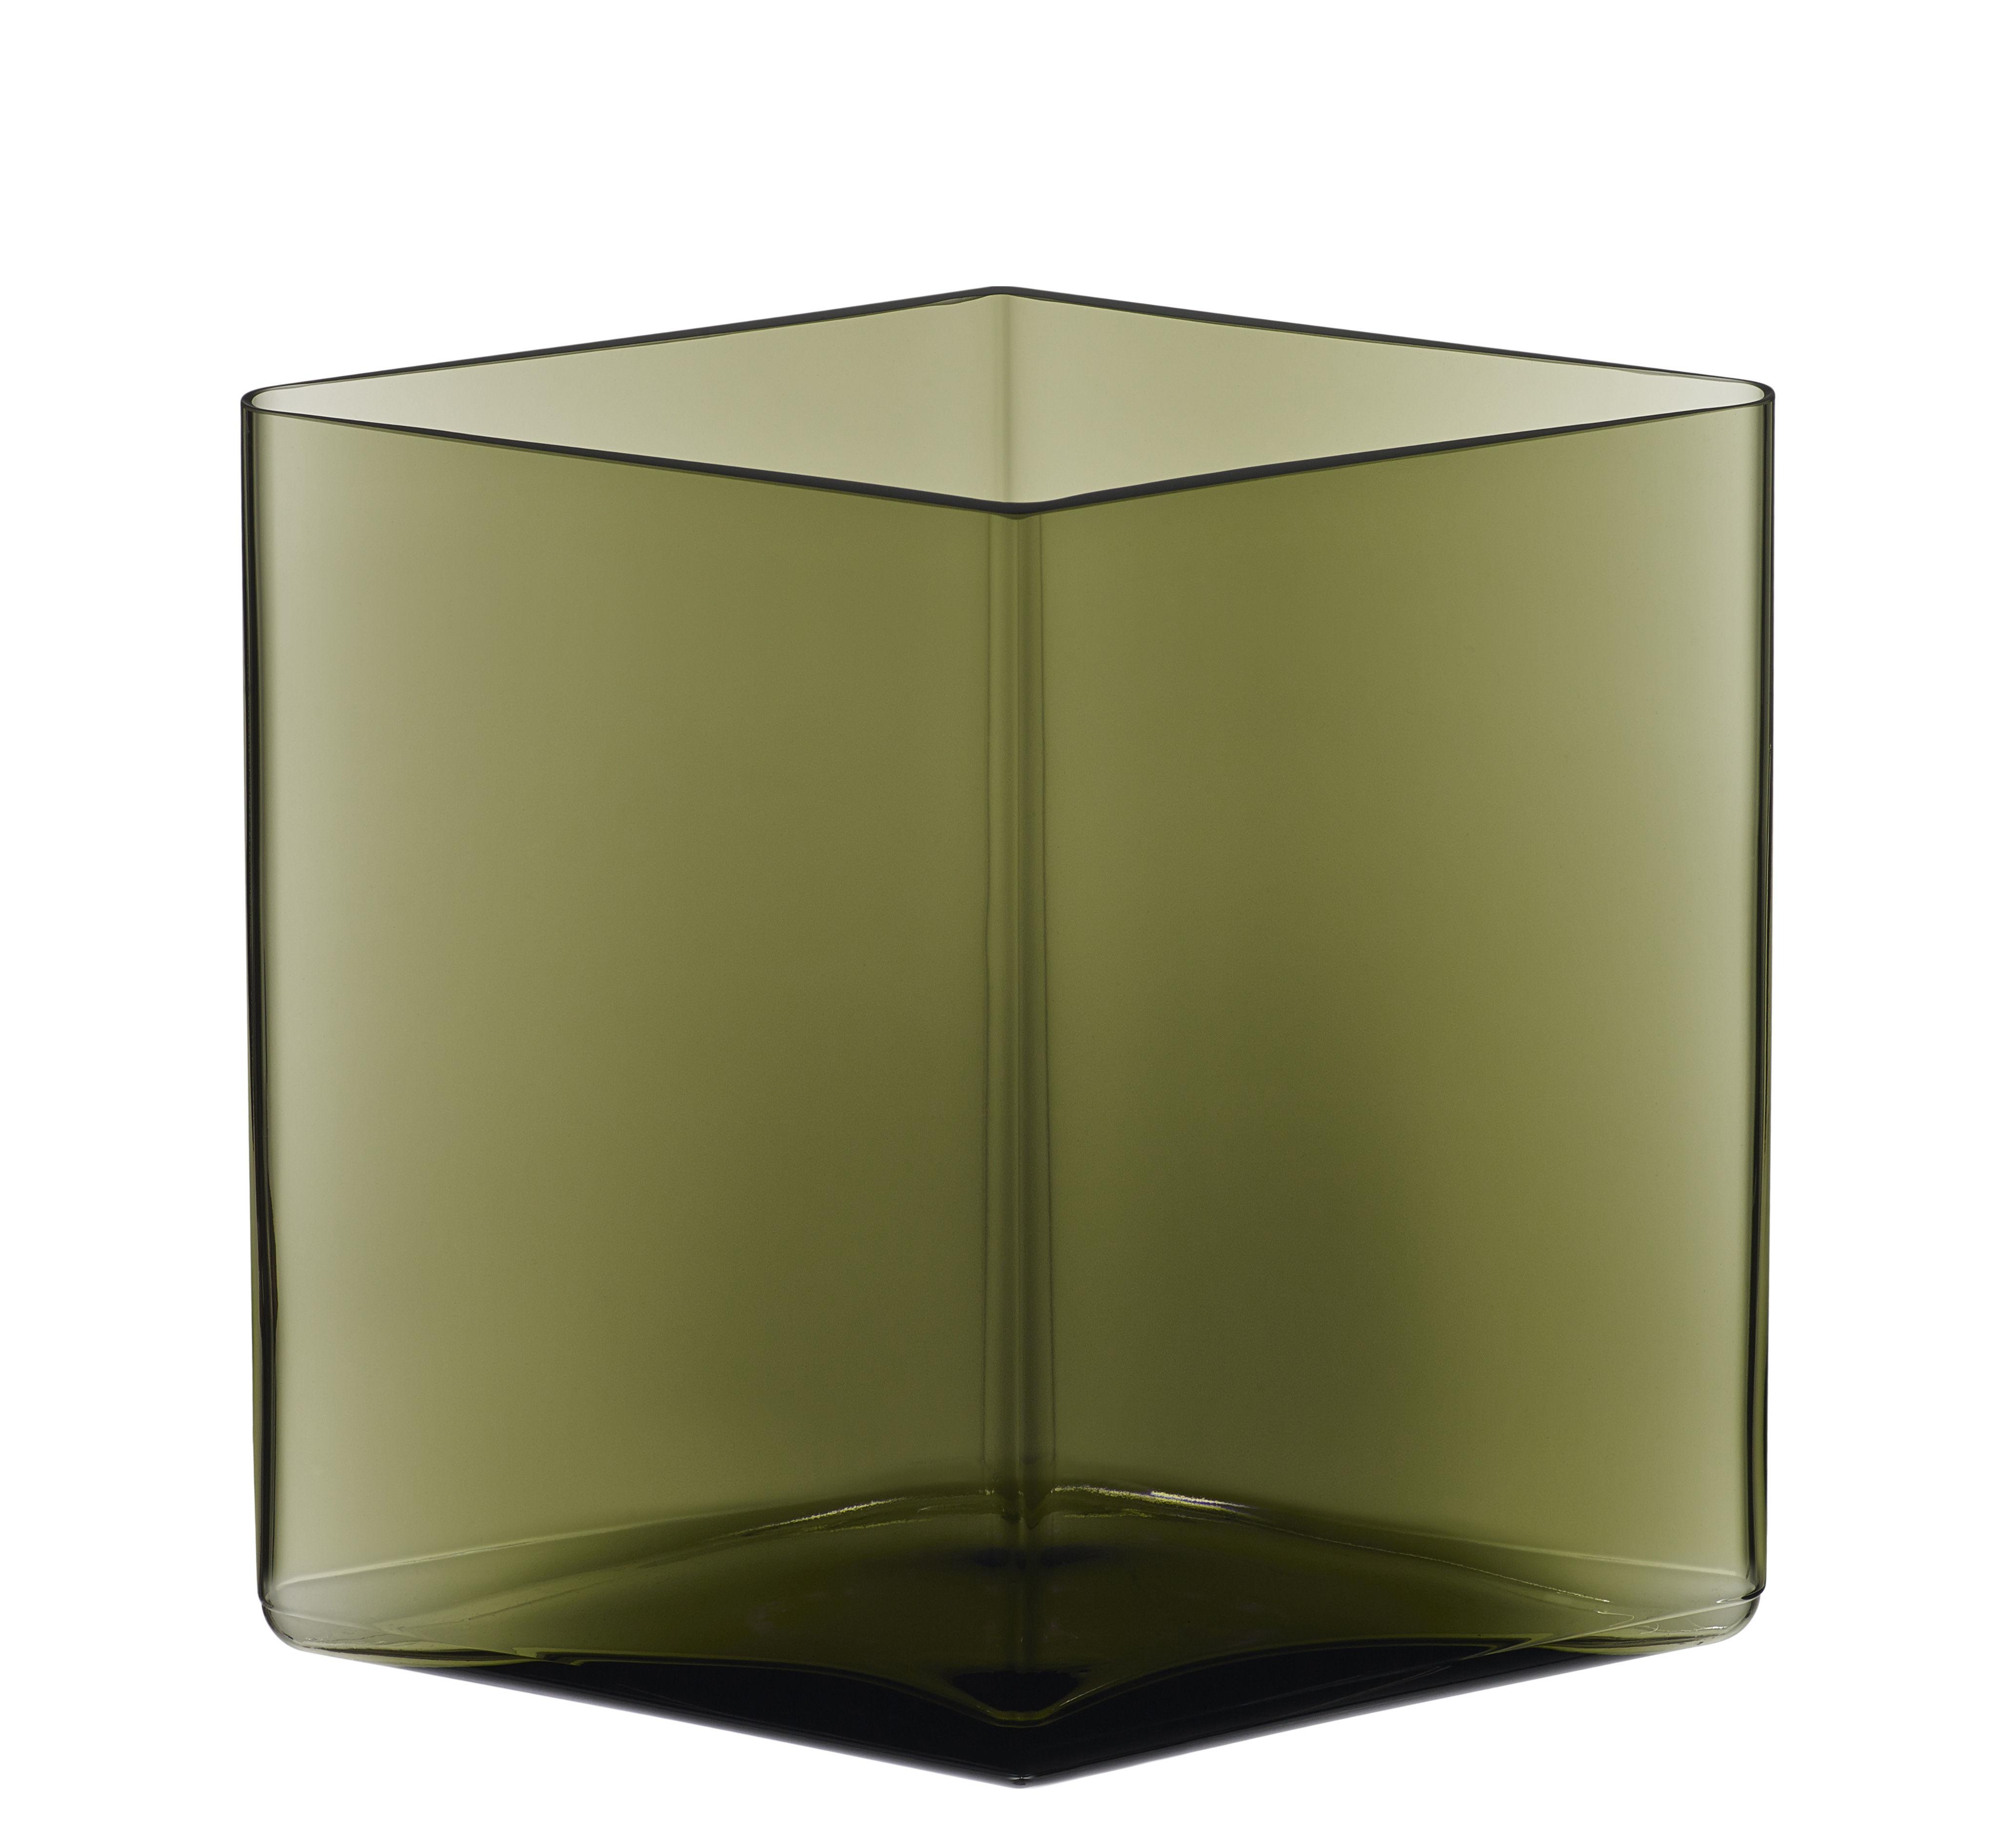 Interni - Vasi - Vaso Ruutu da R. & E. Bouroullec / L 20,5 x H 18 cm - Iittala - Verde mousse - Vetro soffiato a bocca